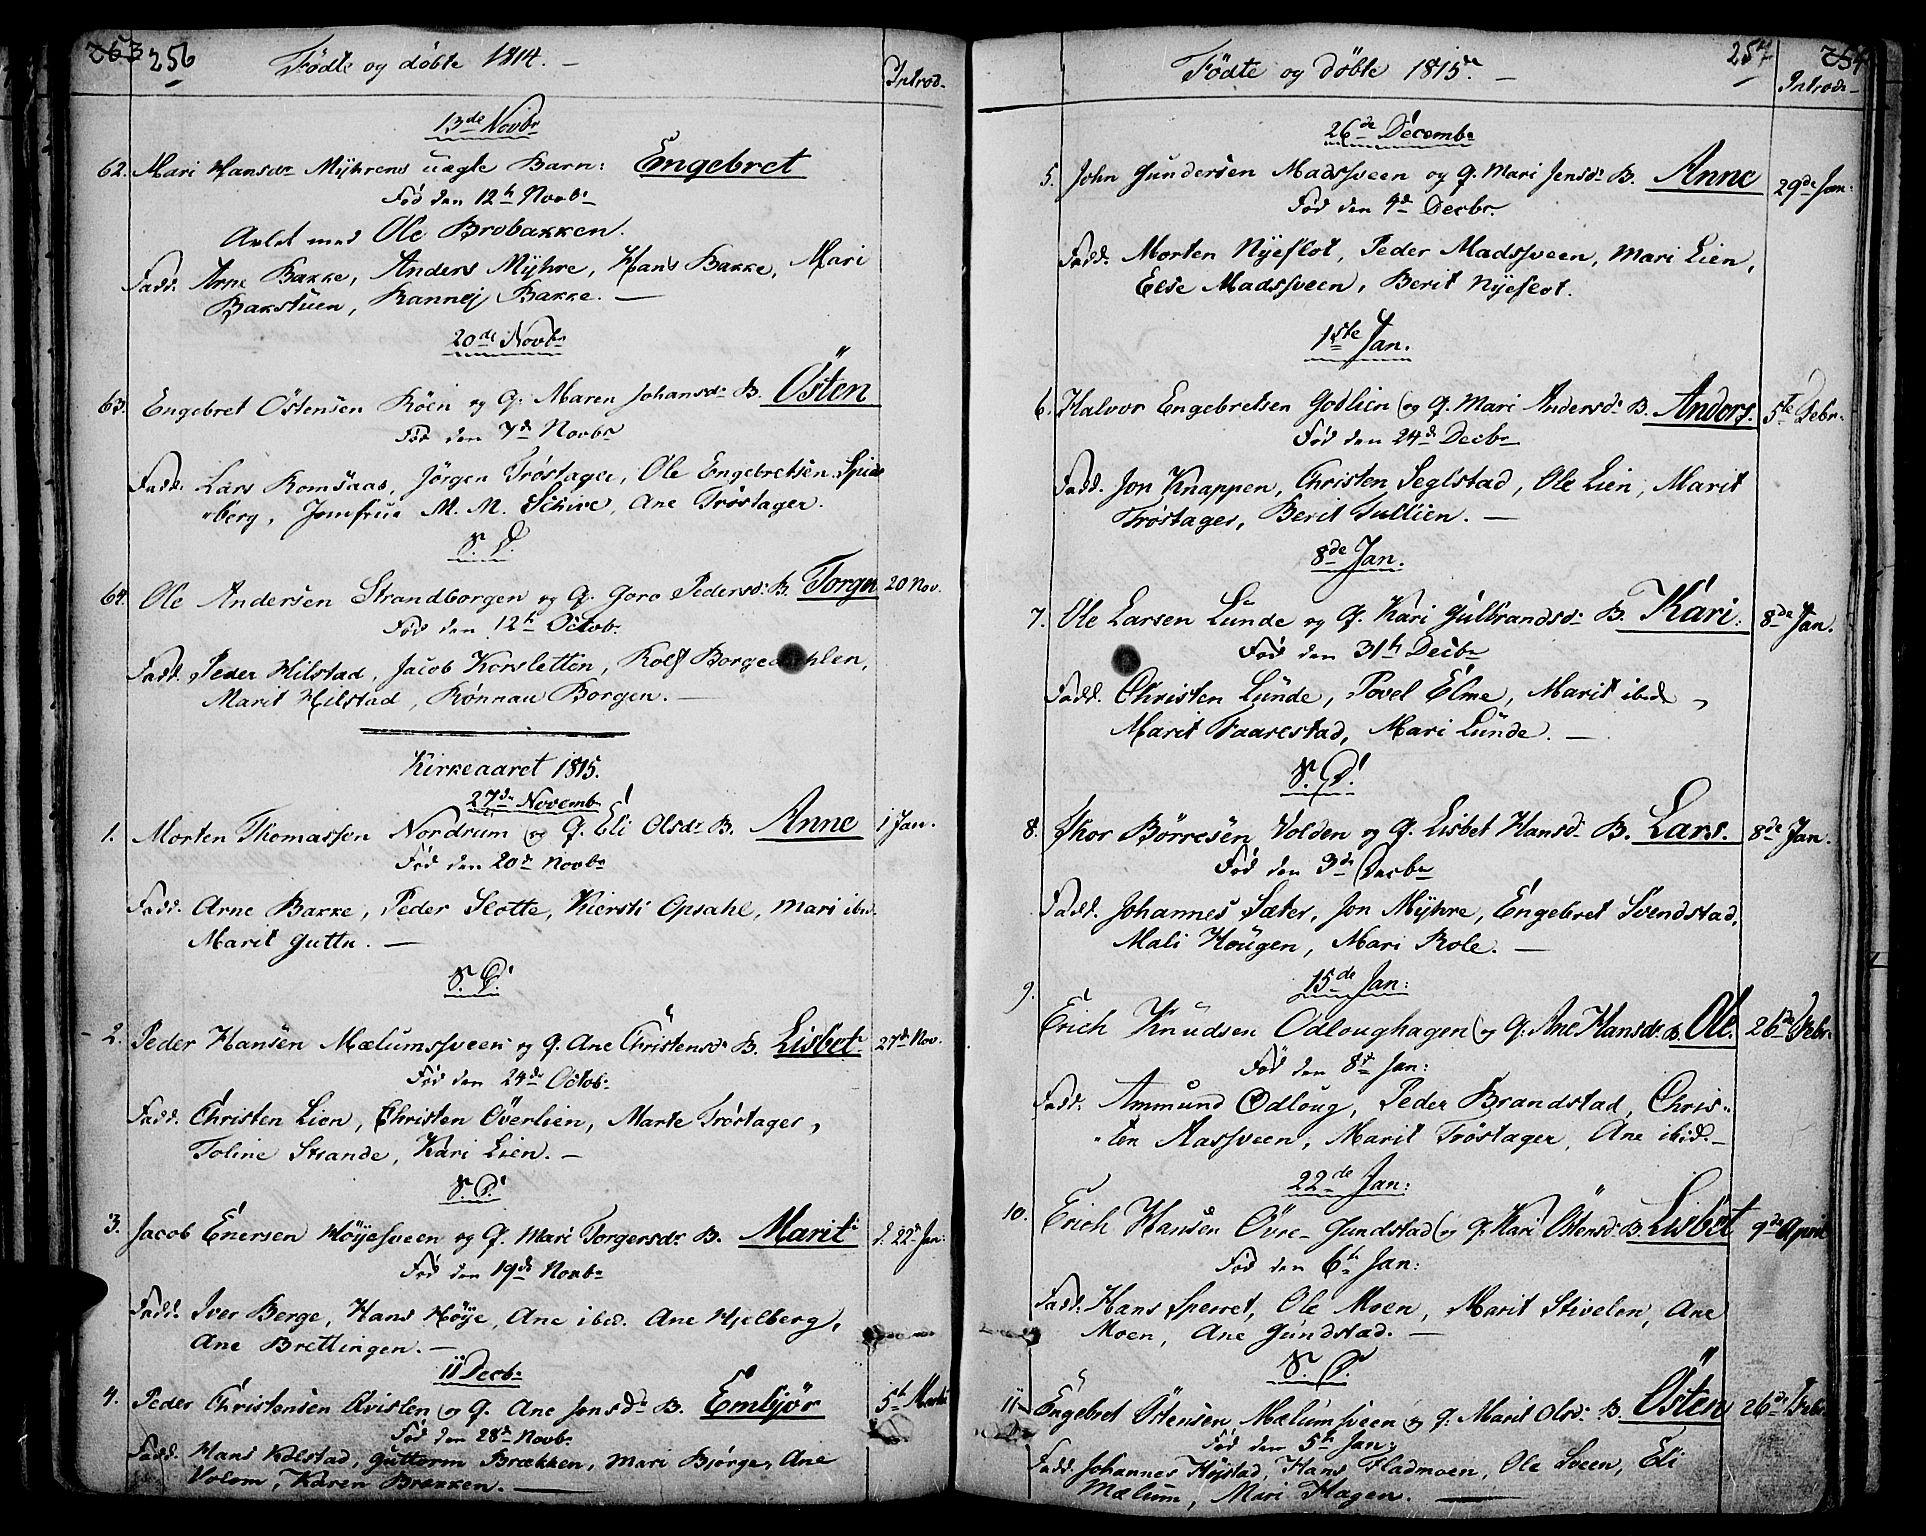 SAH, Ringebu prestekontor, Ministerialbok nr. 3, 1781-1820, s. 256-257